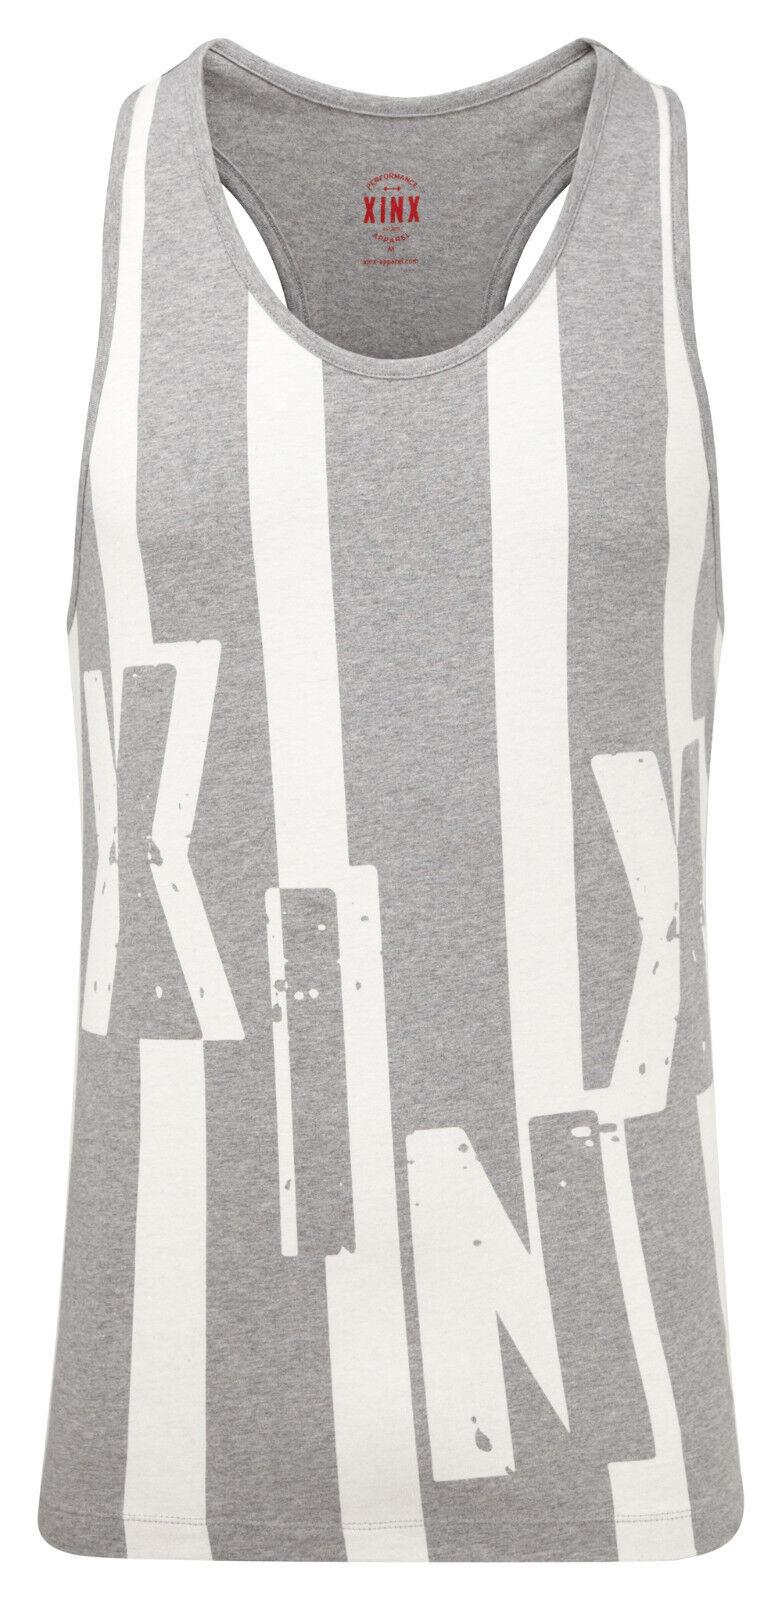 XINX Spotlight Short Sleeve T-Shirt Top Mens Sports Gym Wear Blue XM0021 KB22